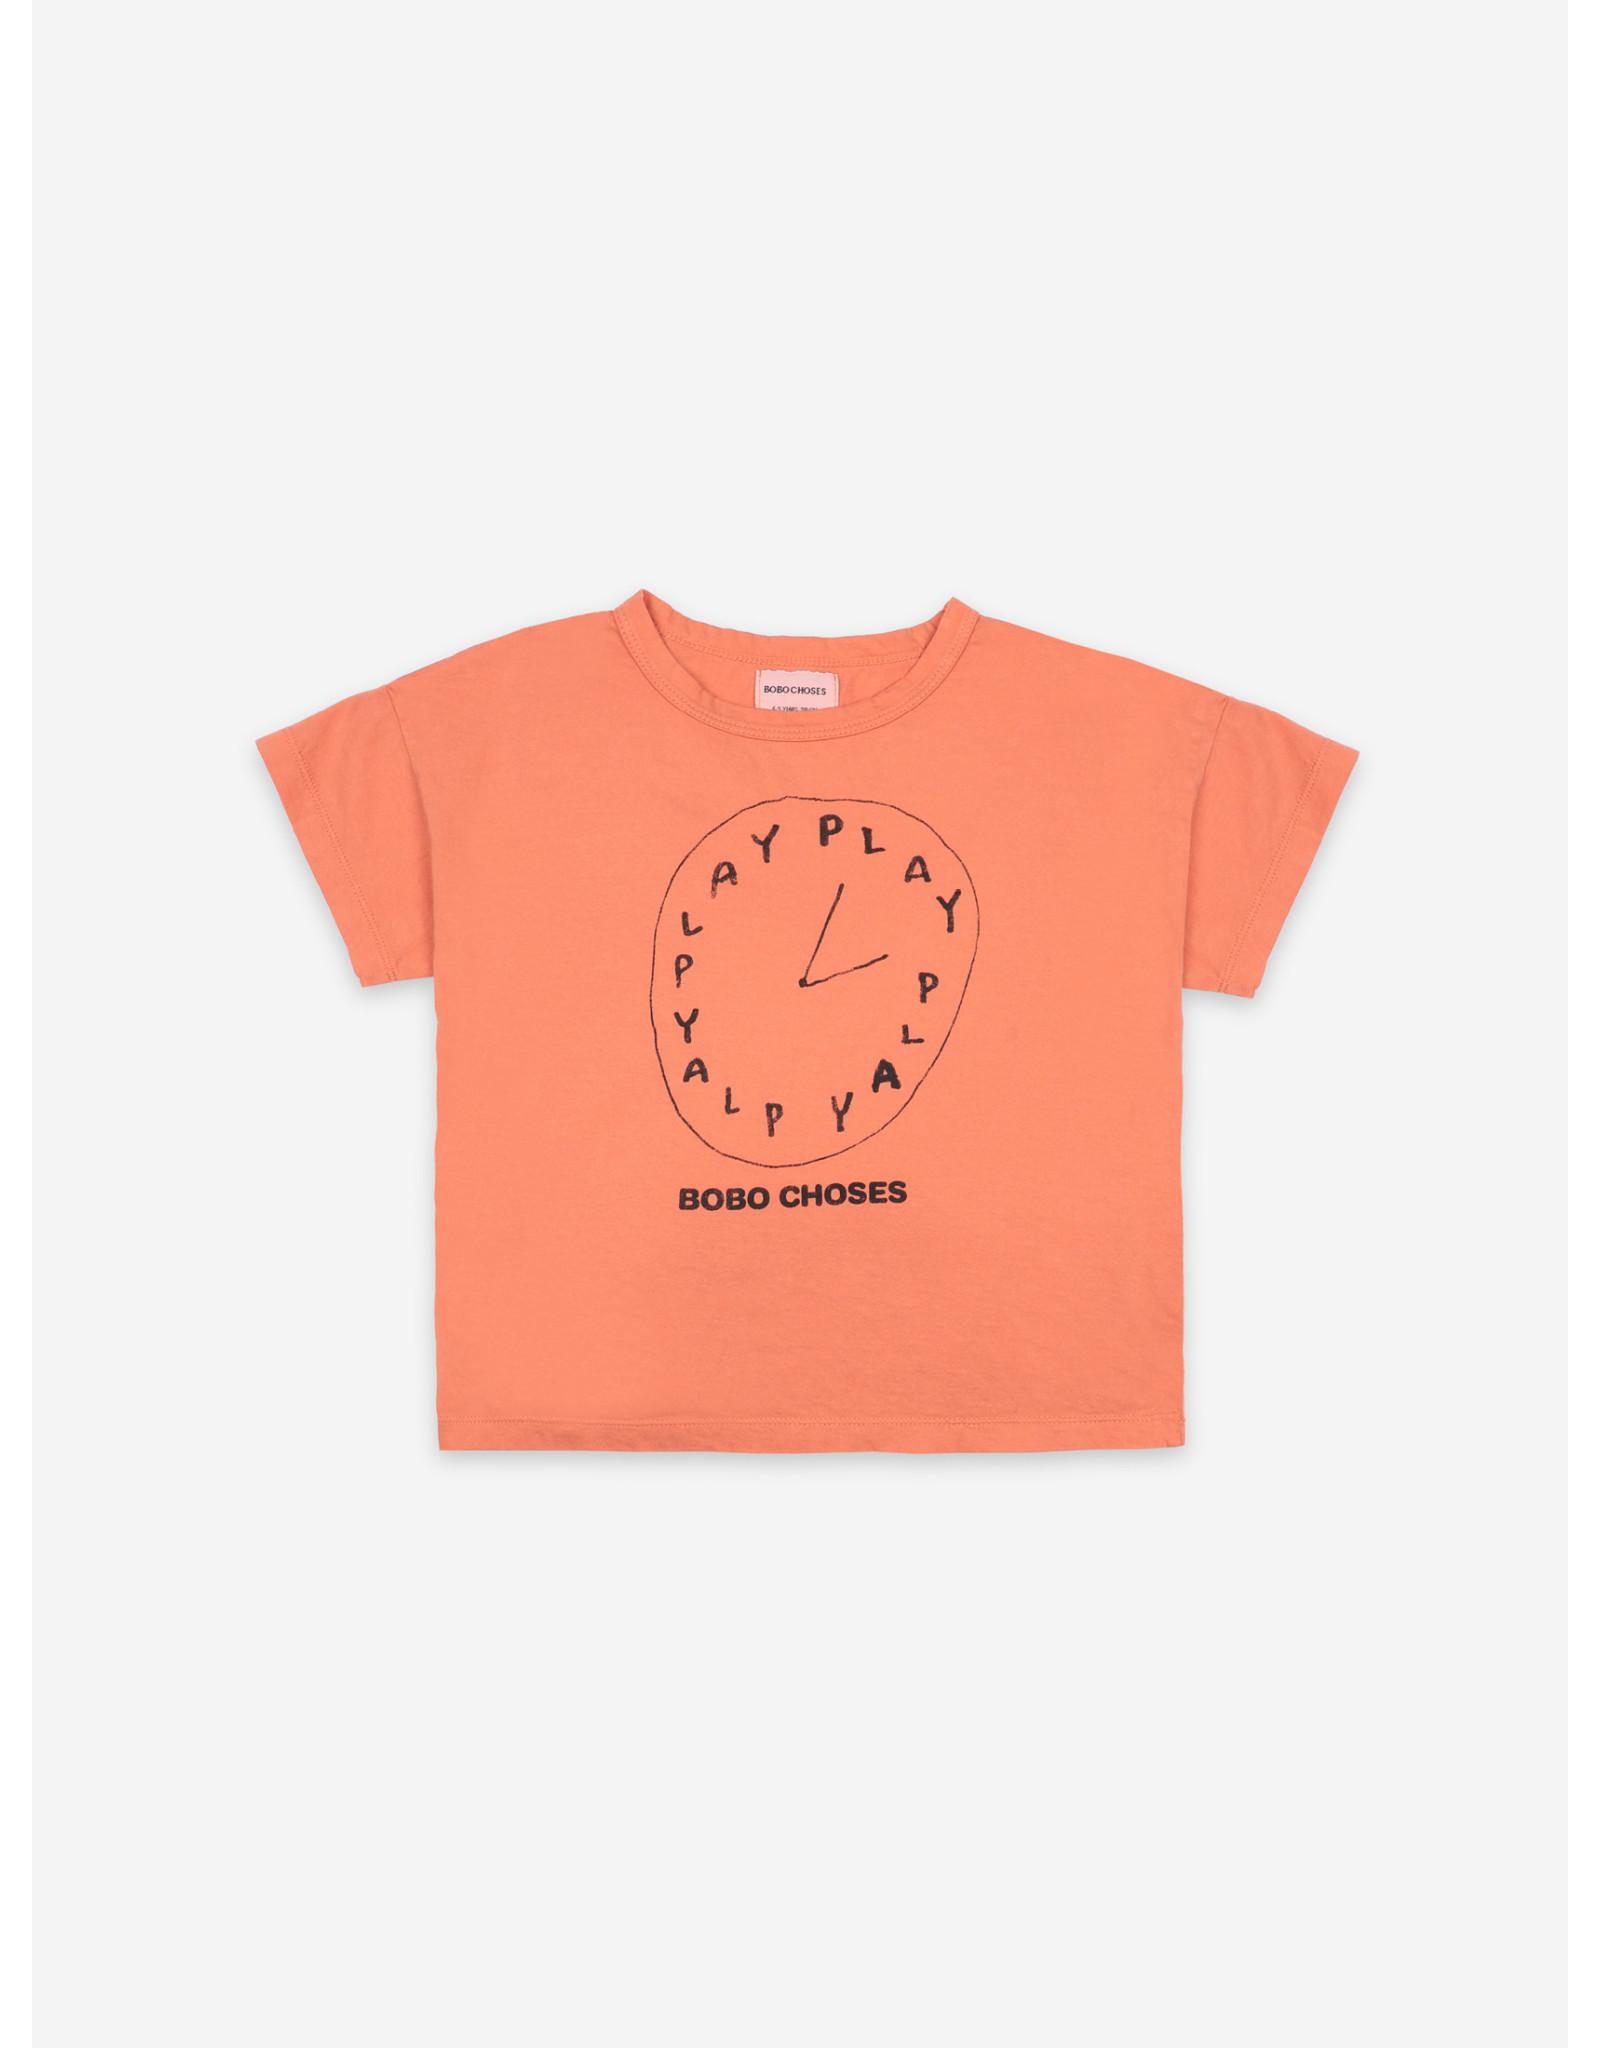 Bobo Choses Bobo Choses Playtime Short Sleeve T-shirt